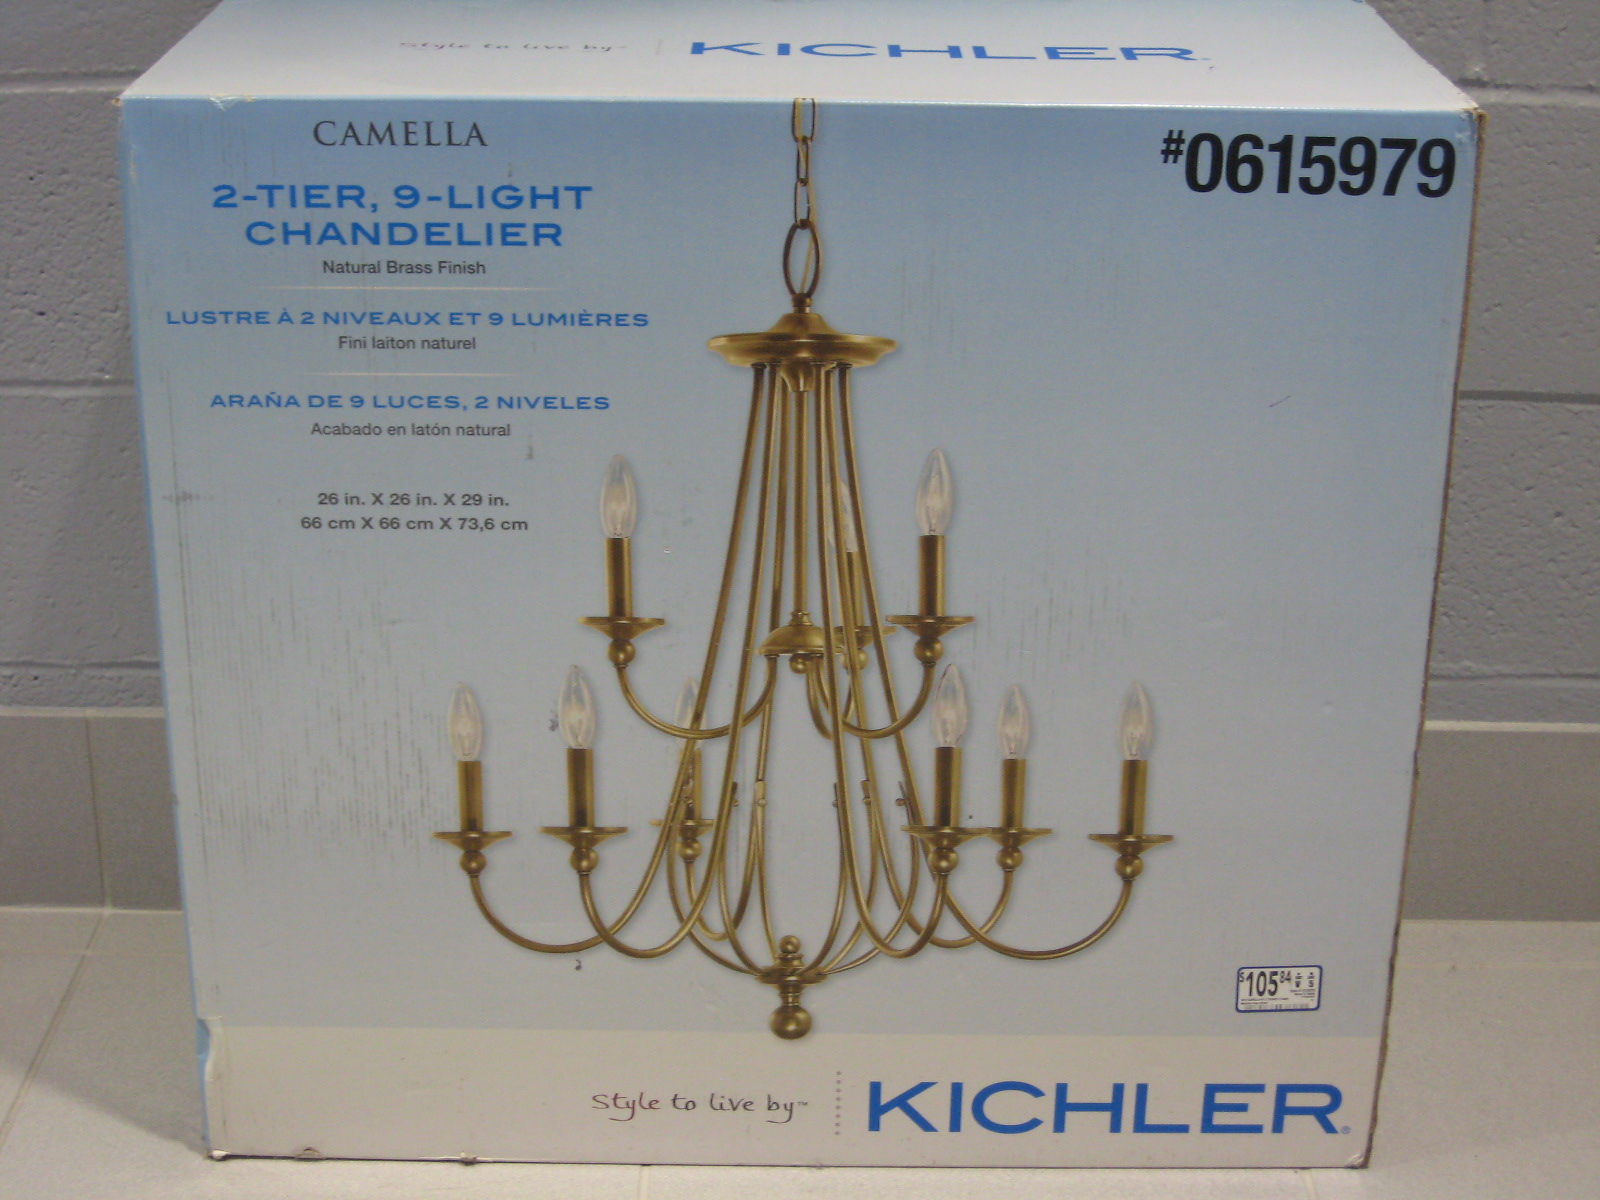 Kichler 2 Tier 9 Light Chandelier